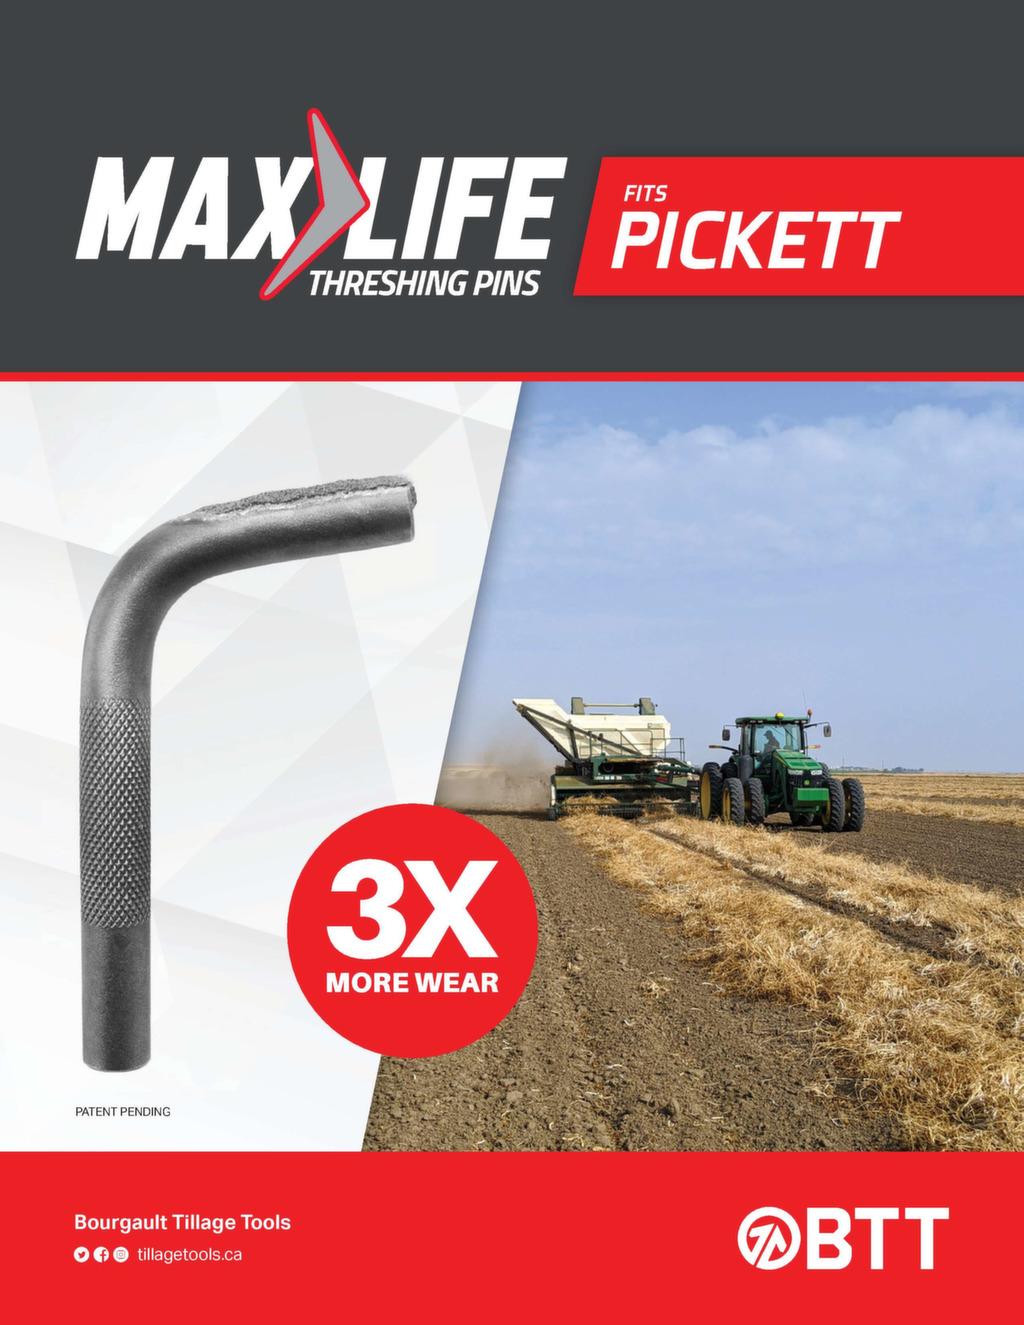 max life threshing pins